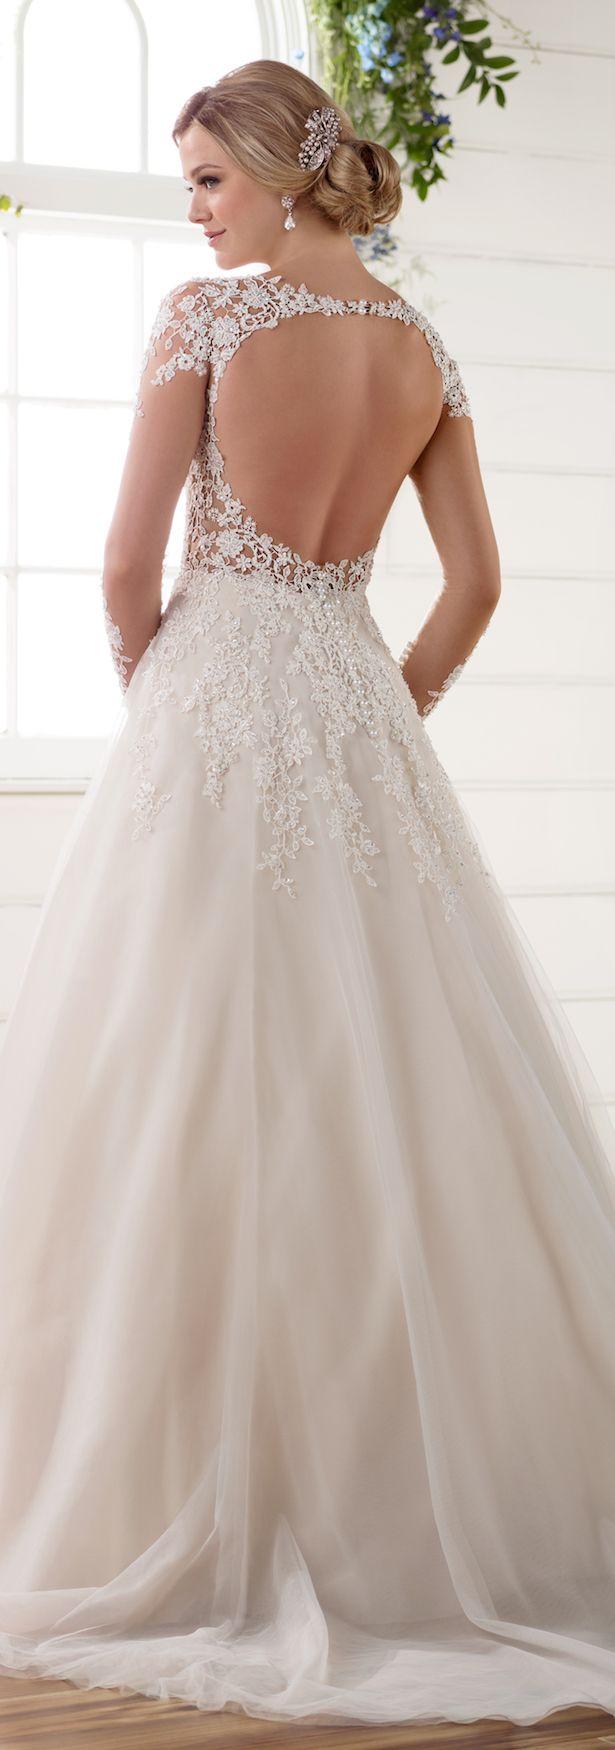 Lace wedding dress under 200 november 2018  best Dresses images on Pinterest  Bridal gowns Party dresses